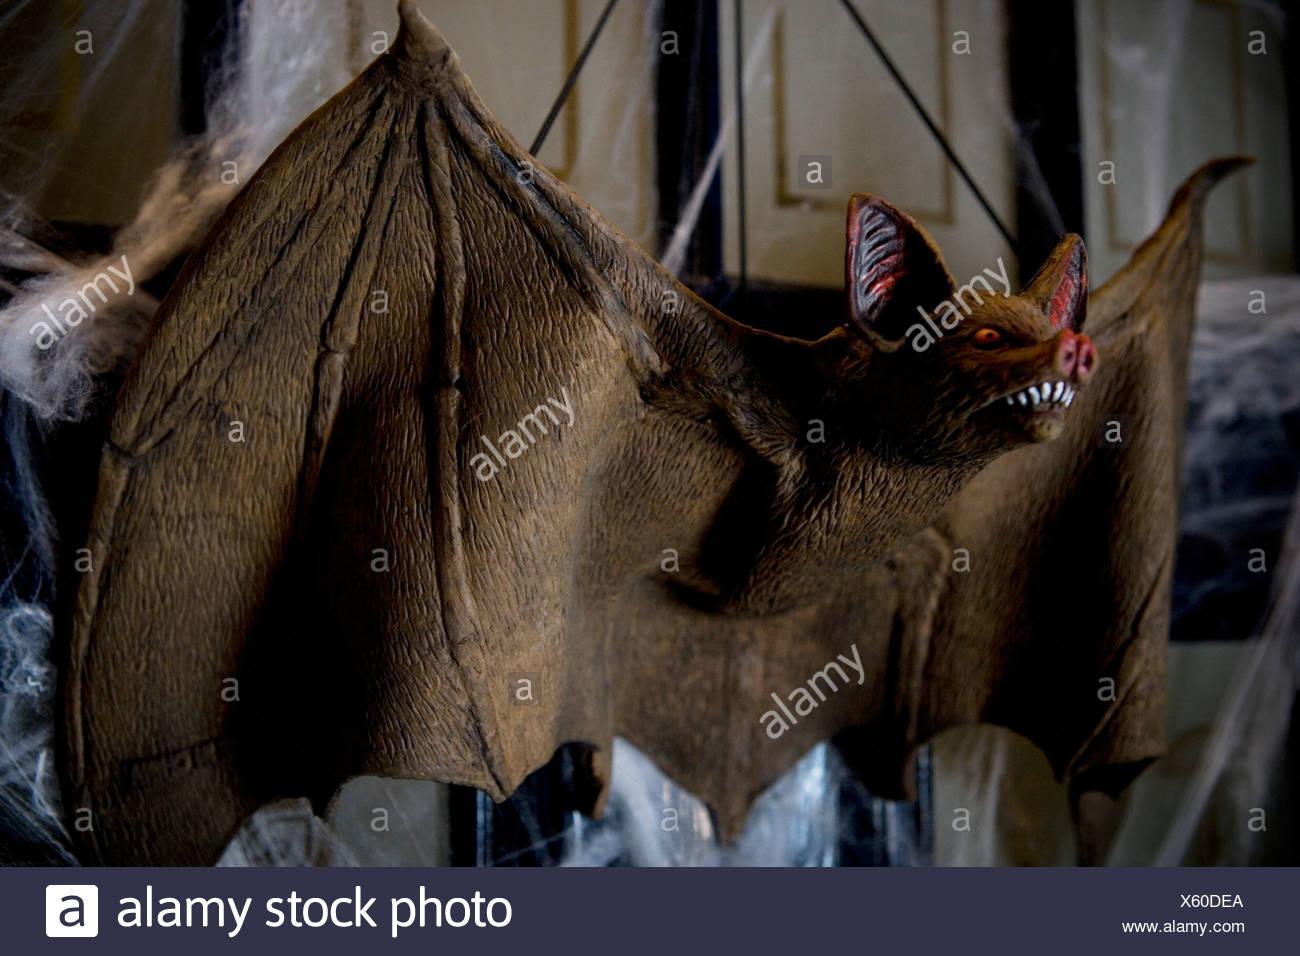 halloween decorations - toy vampire bat stock photo: 279064418 - alamy